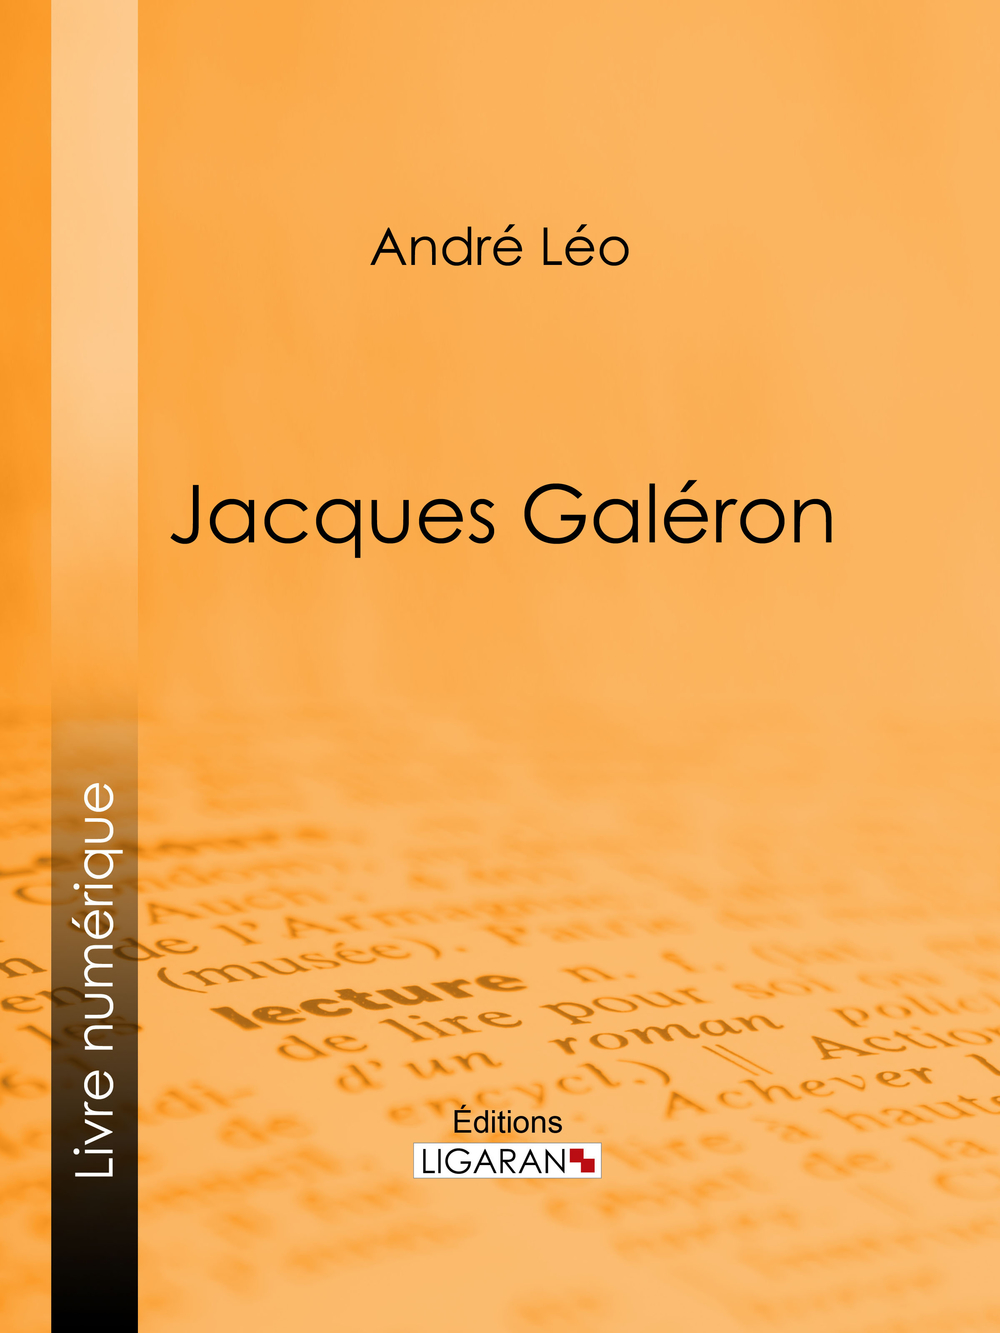 Jacques Galéron